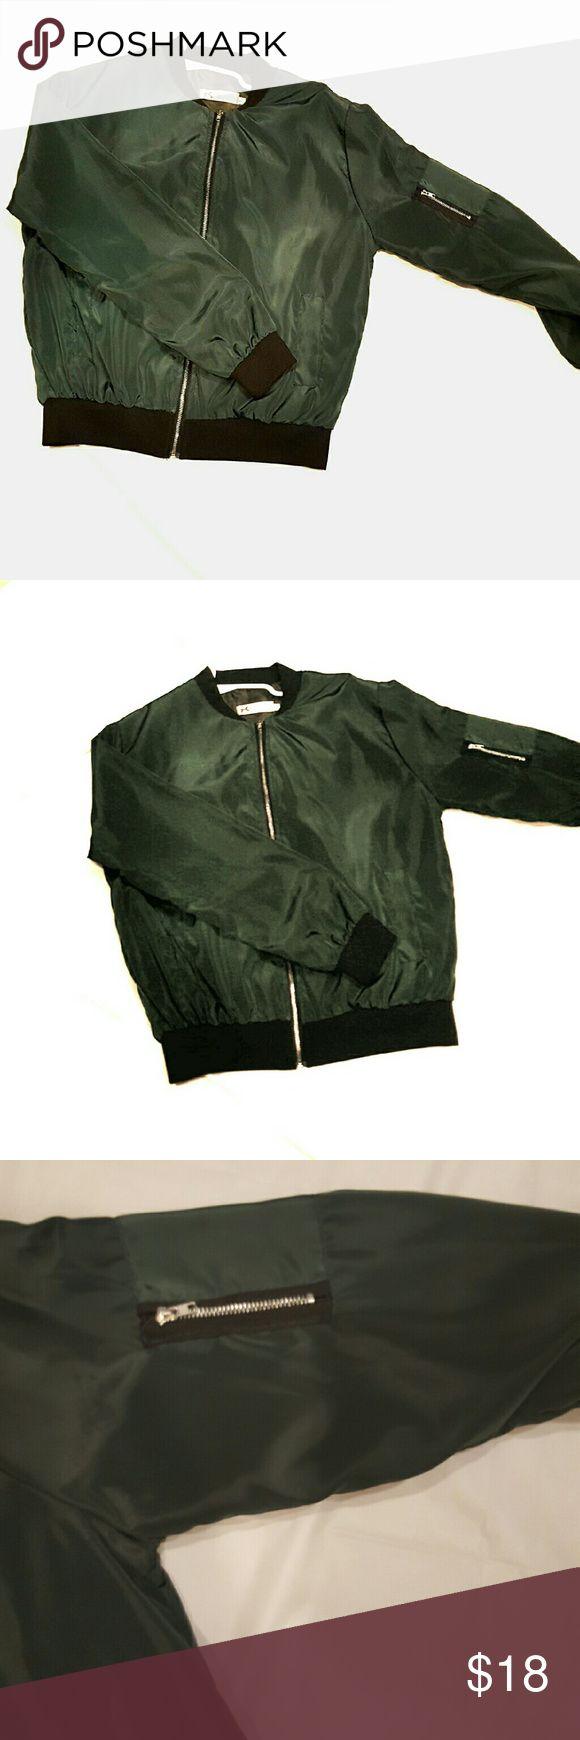 Green Lightweight Bomber Jacket Green, Super Lightweight, Bomber Jacket. Zipper on arm, 2 Pockets in Front. Size Large, but it runs a little small, so I am listing as a medium. Jackets & Coats